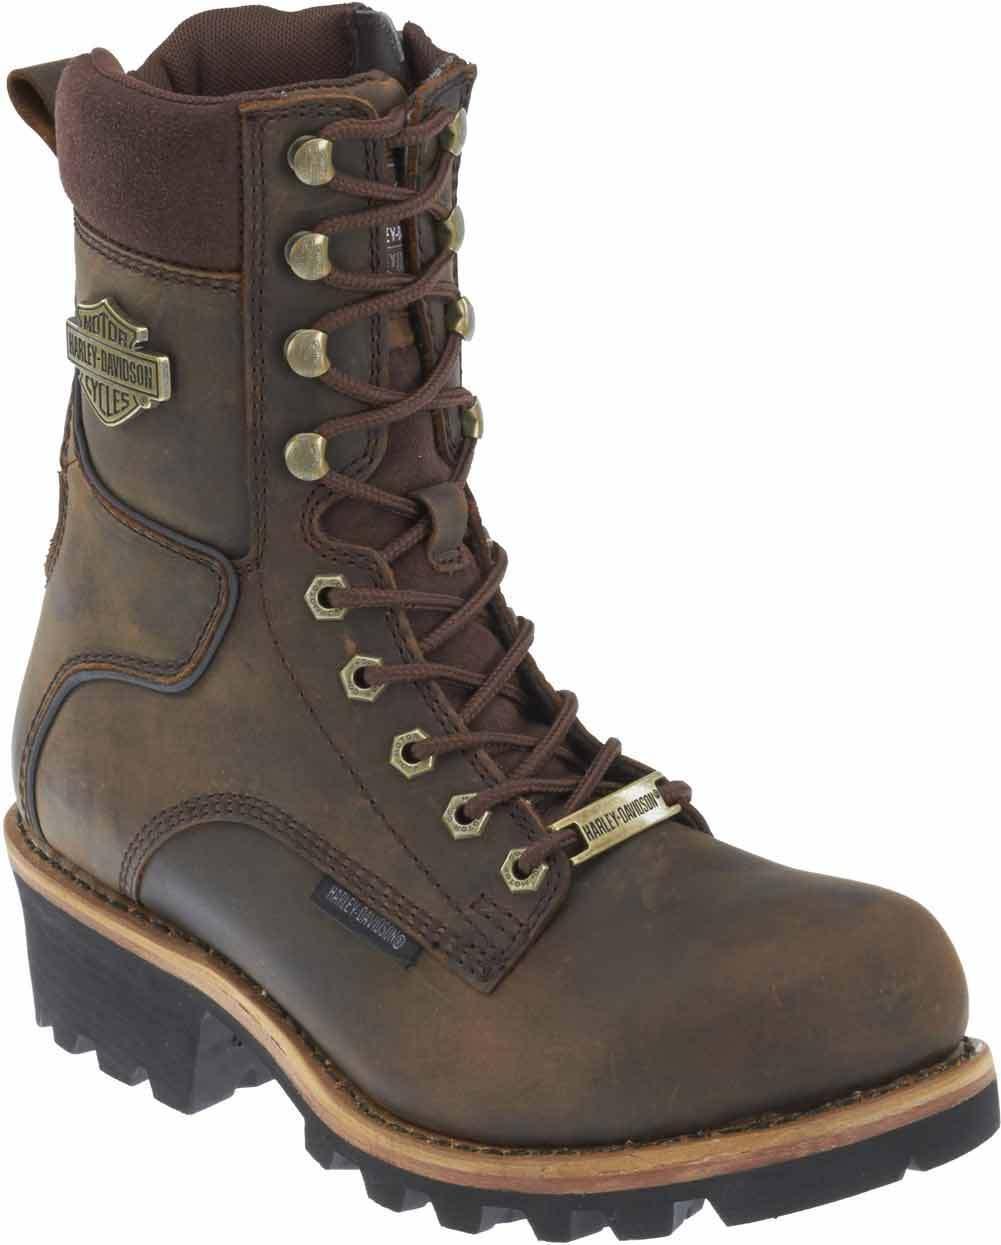 Skechers USA Mens Tom Select Cats Utility Shoe- Select Tom SZ/Color. c7b247